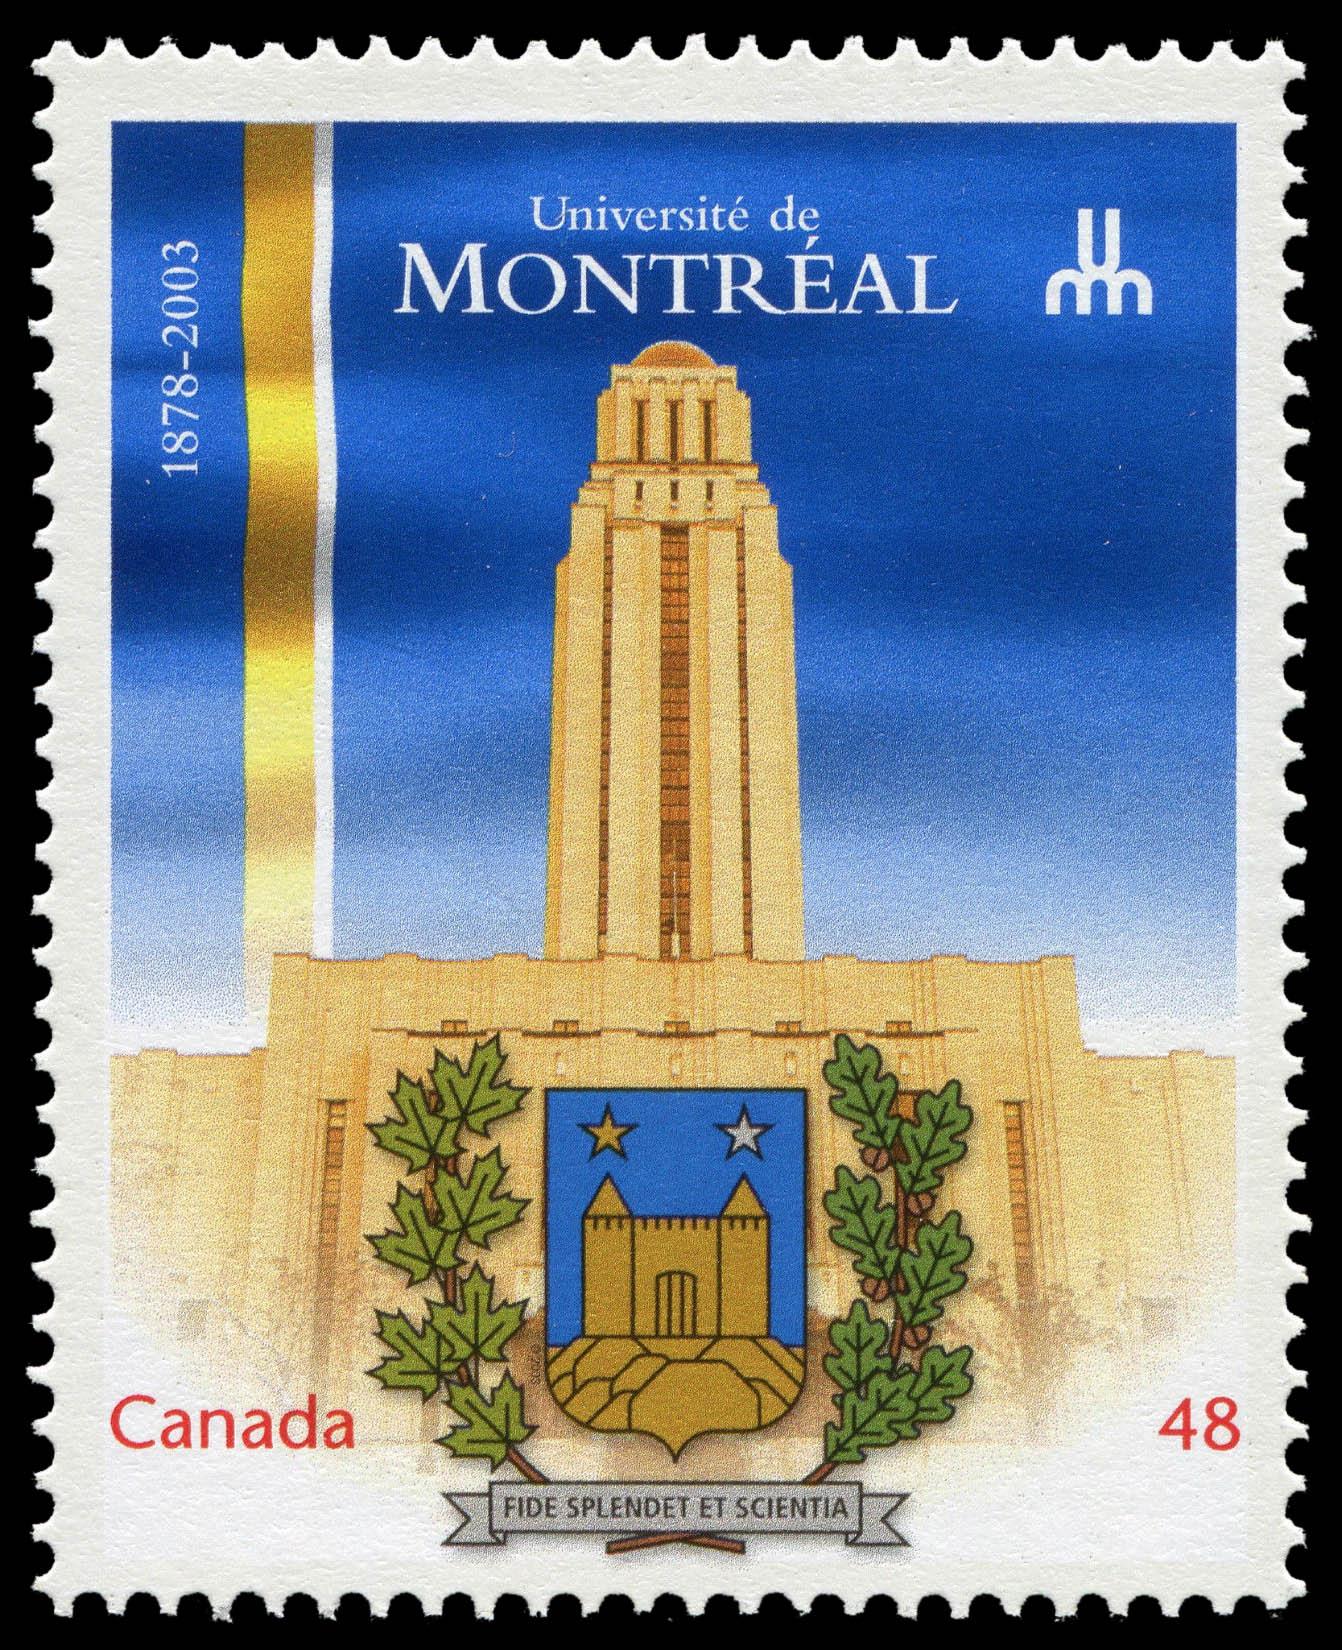 Universite de Montreal, 1878-2003 Canada Postage Stamp | Canadian Universities